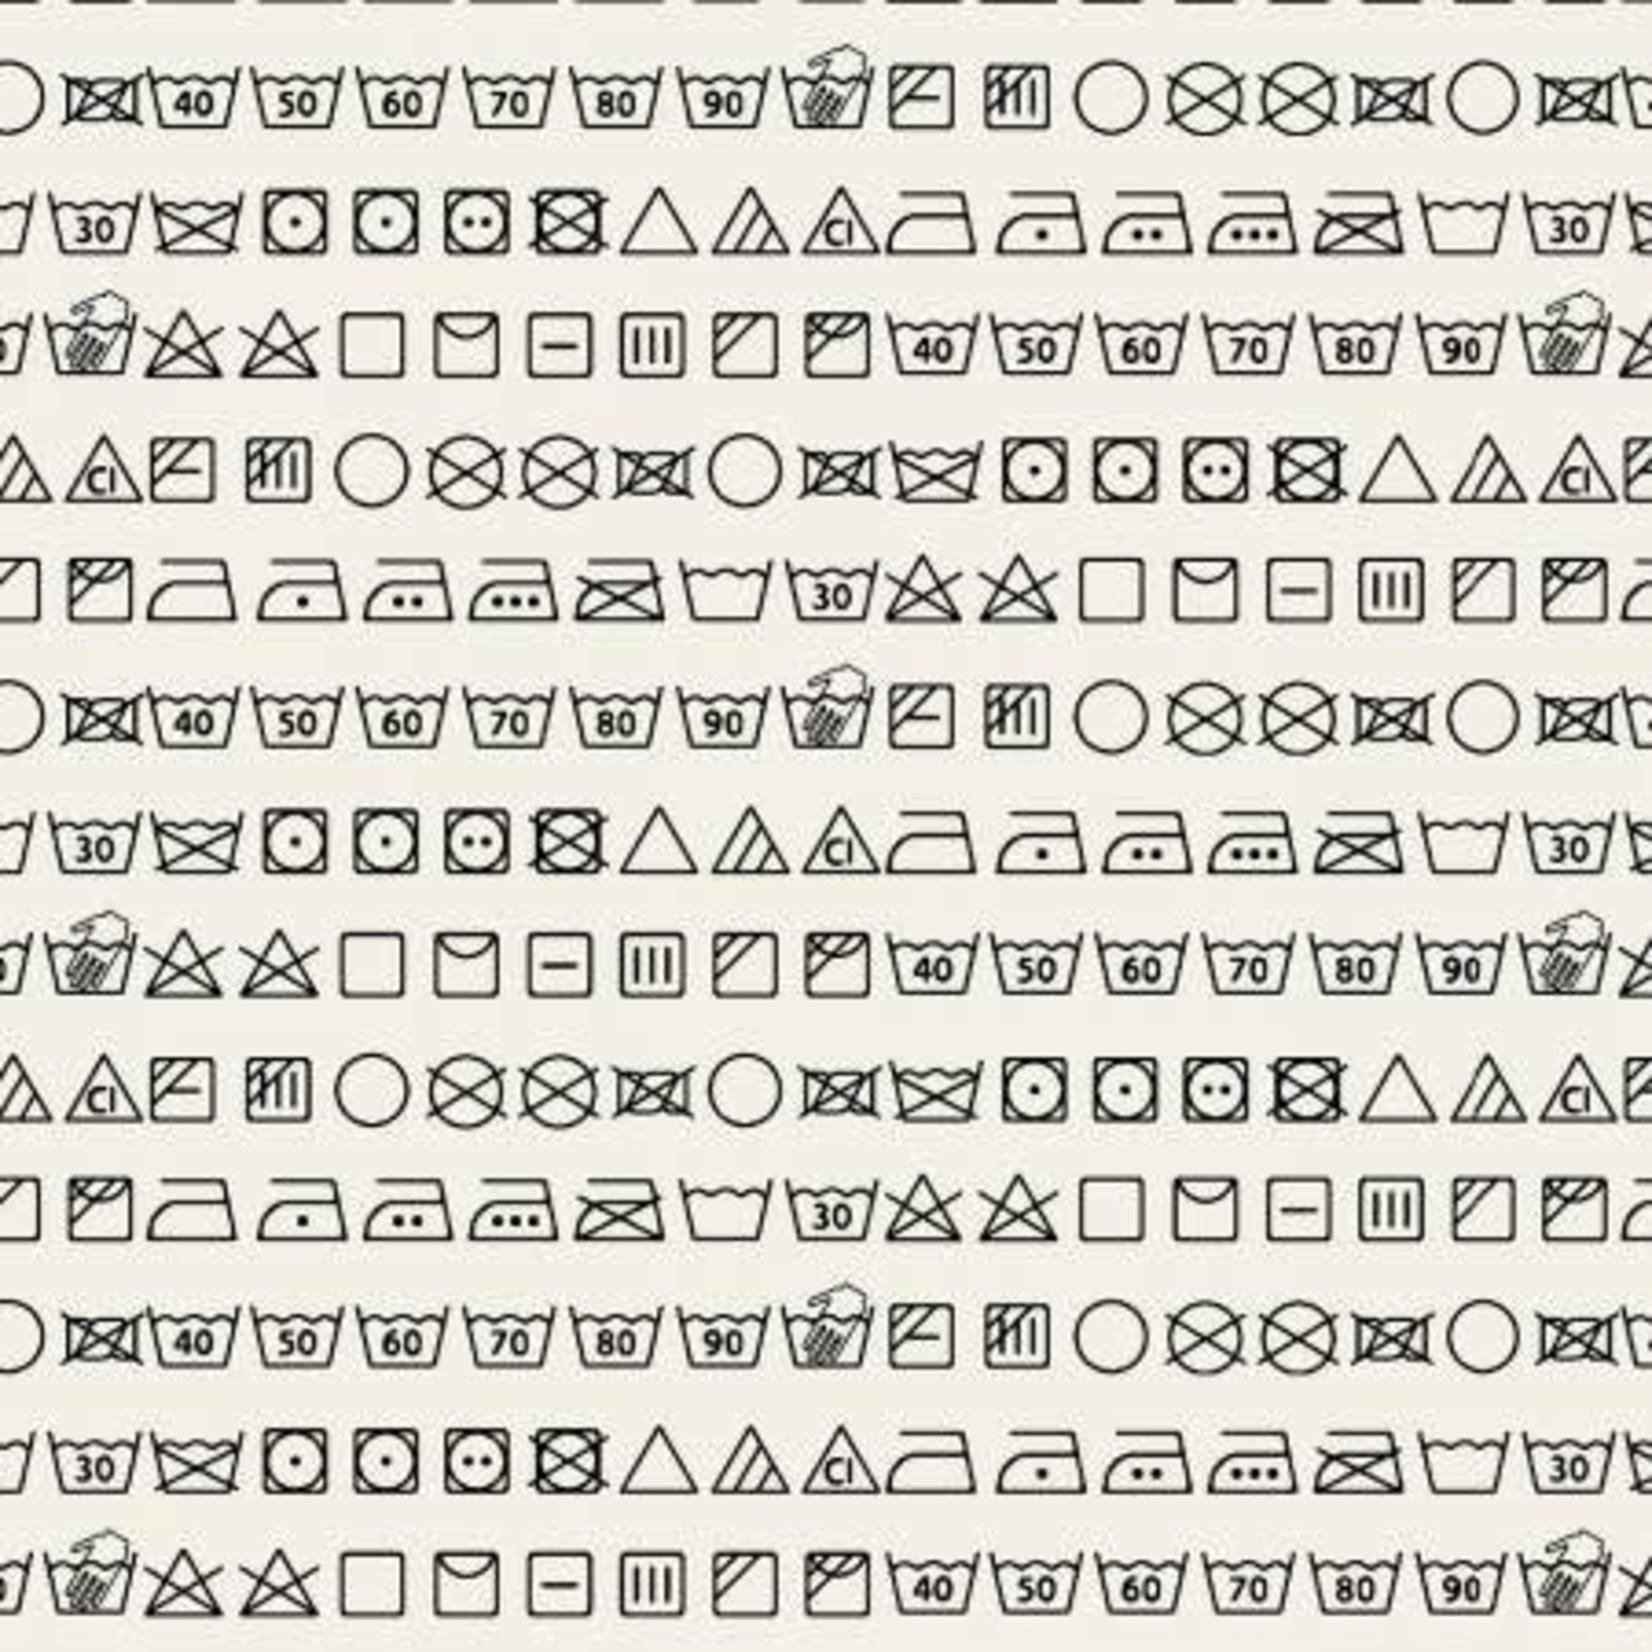 StudioE Fabrics Loads of Fun - Care Symbols - Black